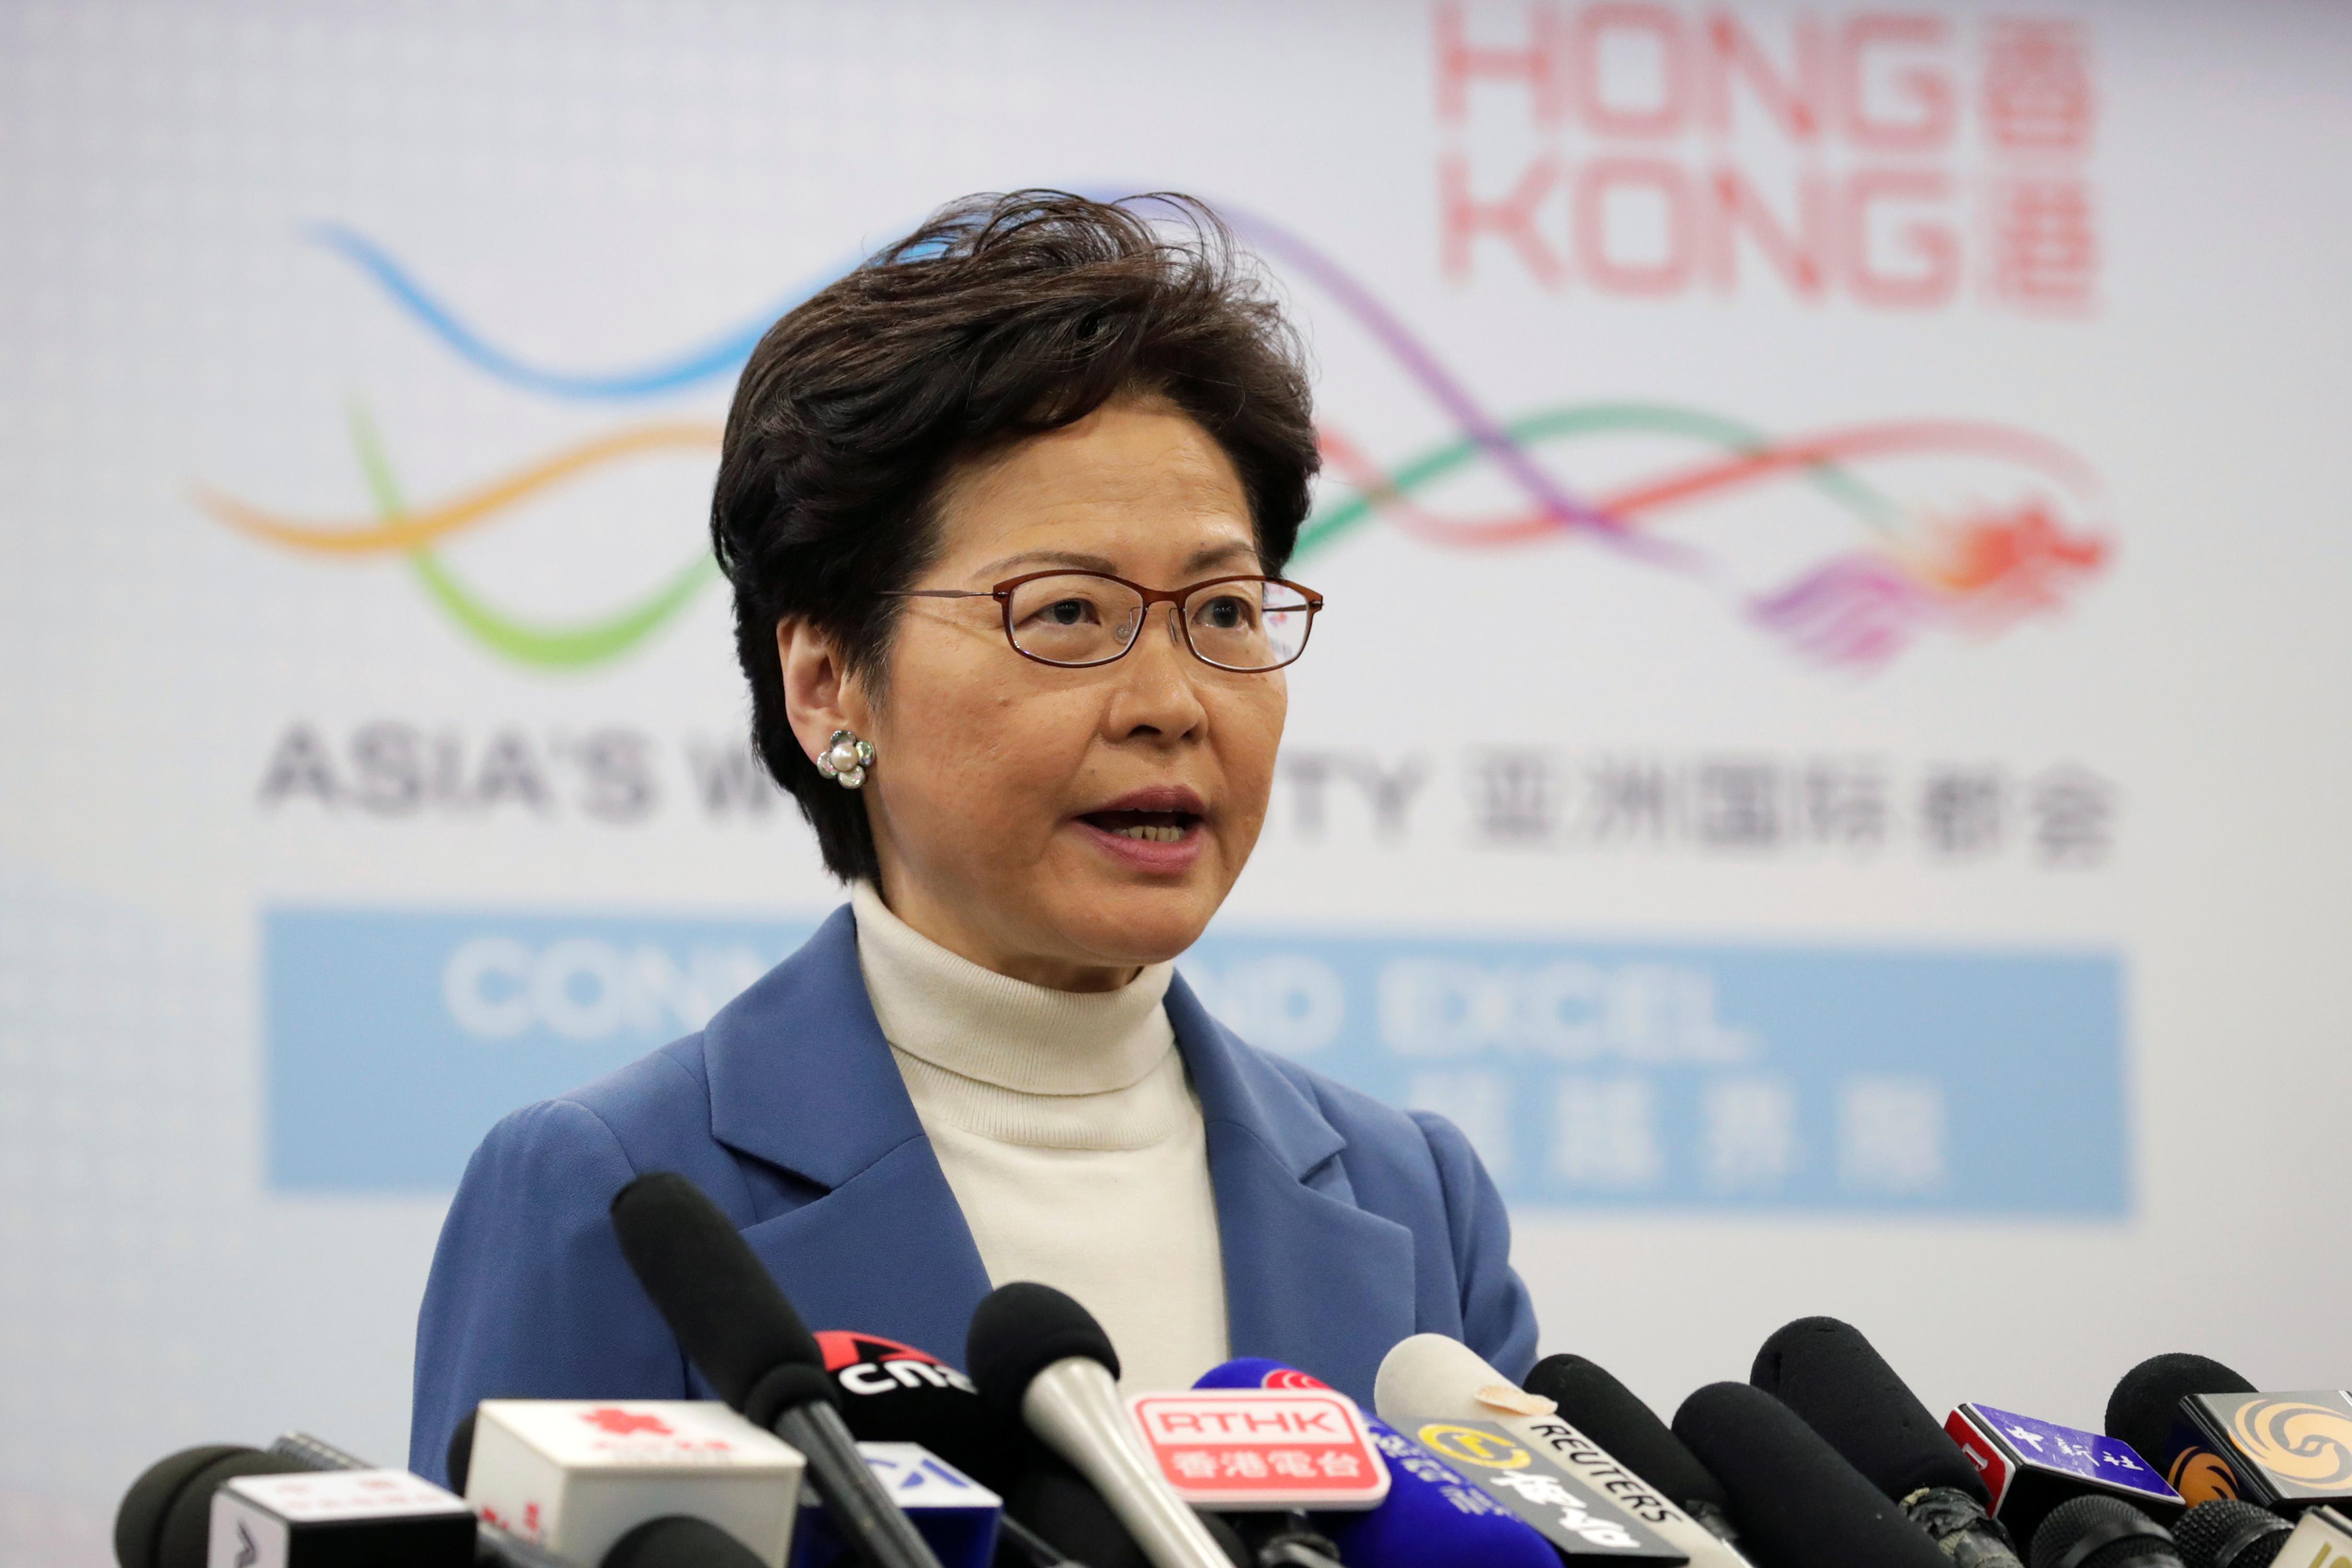 Coronavirus, contestation sociale : Hong Kong en opération de réhabilitation à Davos